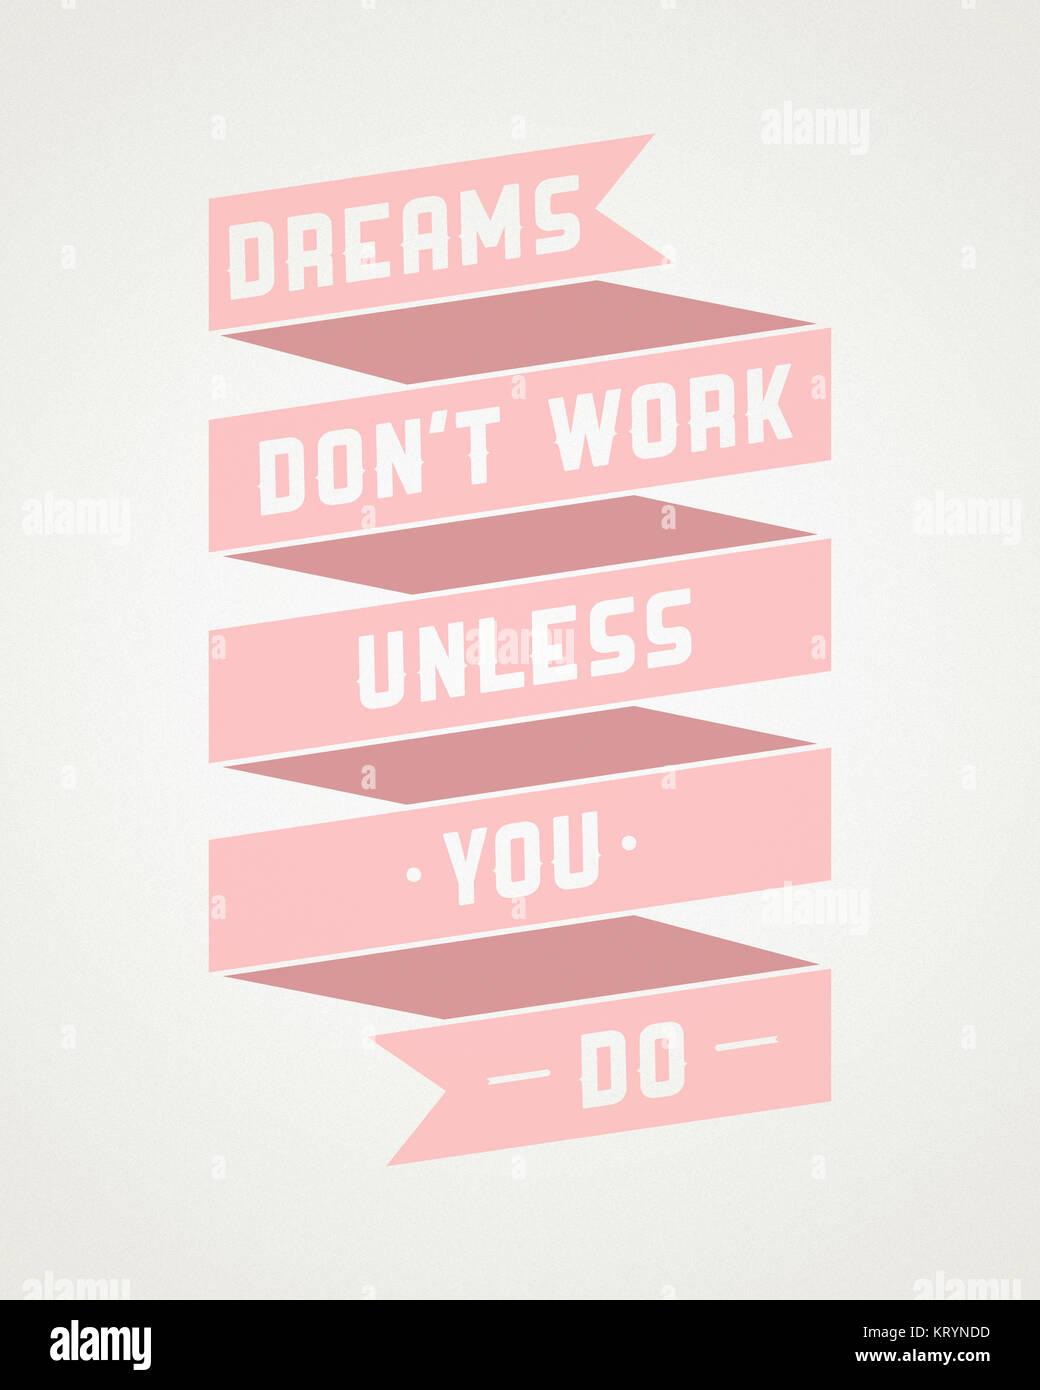 Motivational Phrases Motivational Phrases Stock Photos & Motivational Phrases Stock